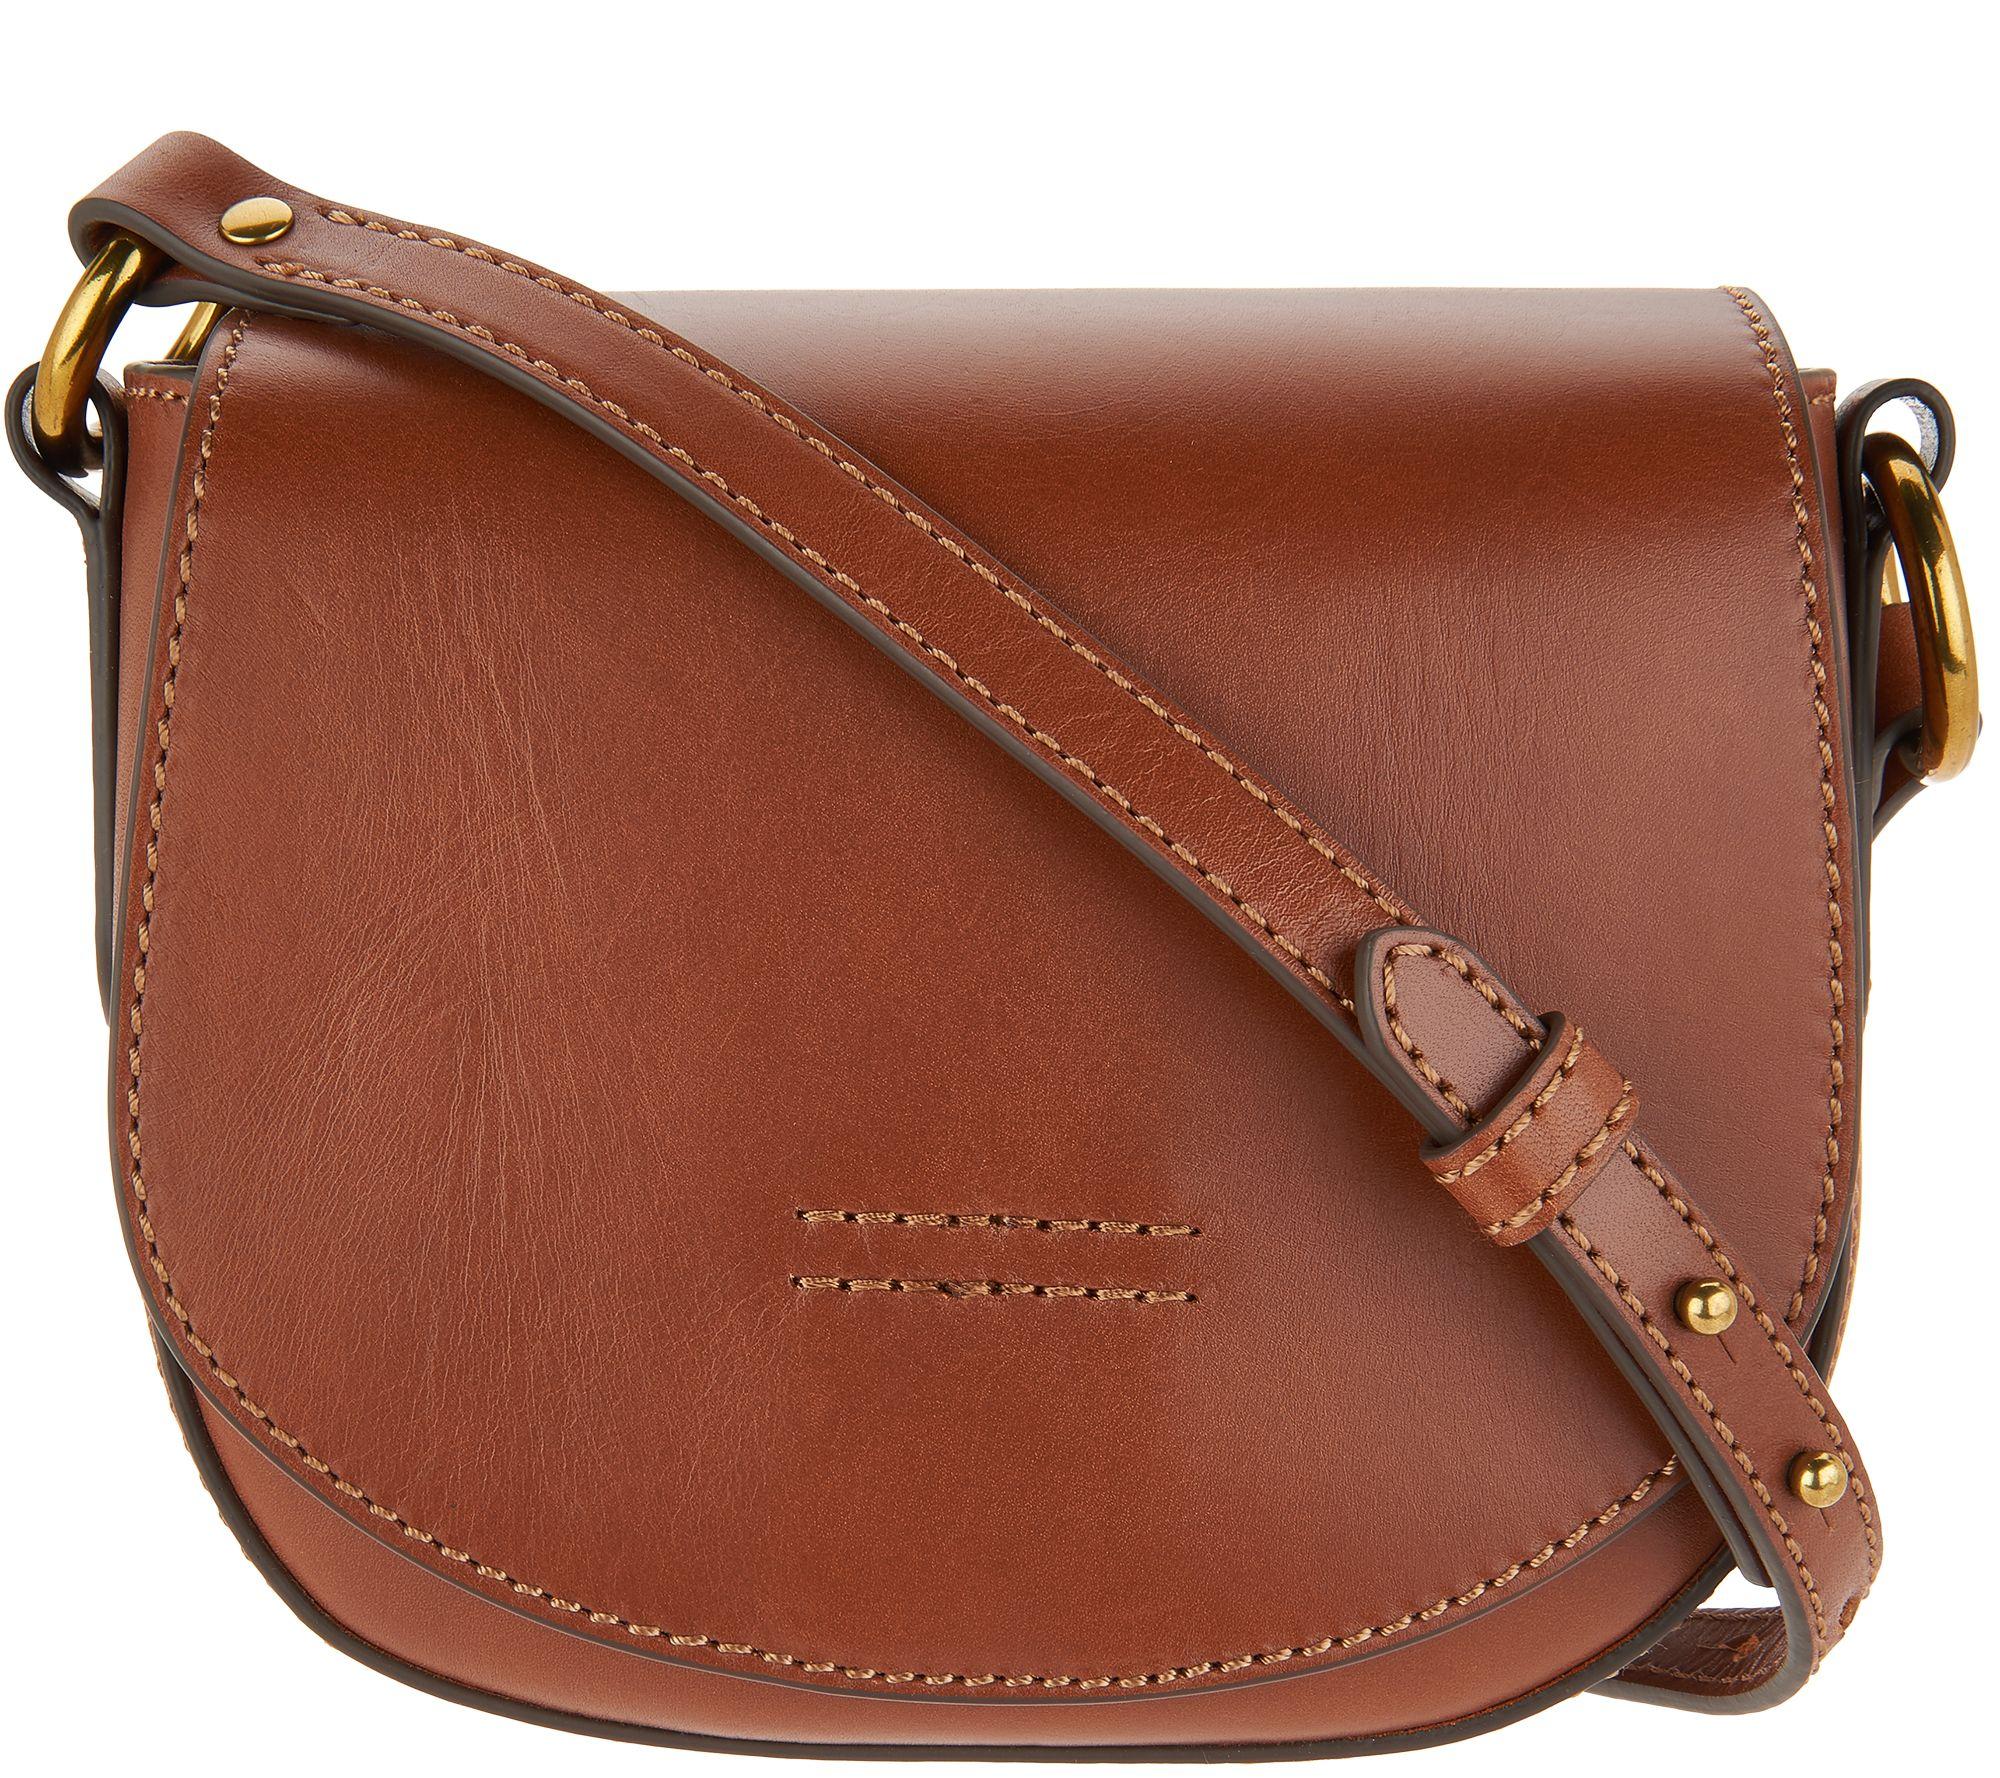 Frye Leather Harness Small Saddle Crossbody Handbag - Page 1 — QVC.com f04defd7c6c70